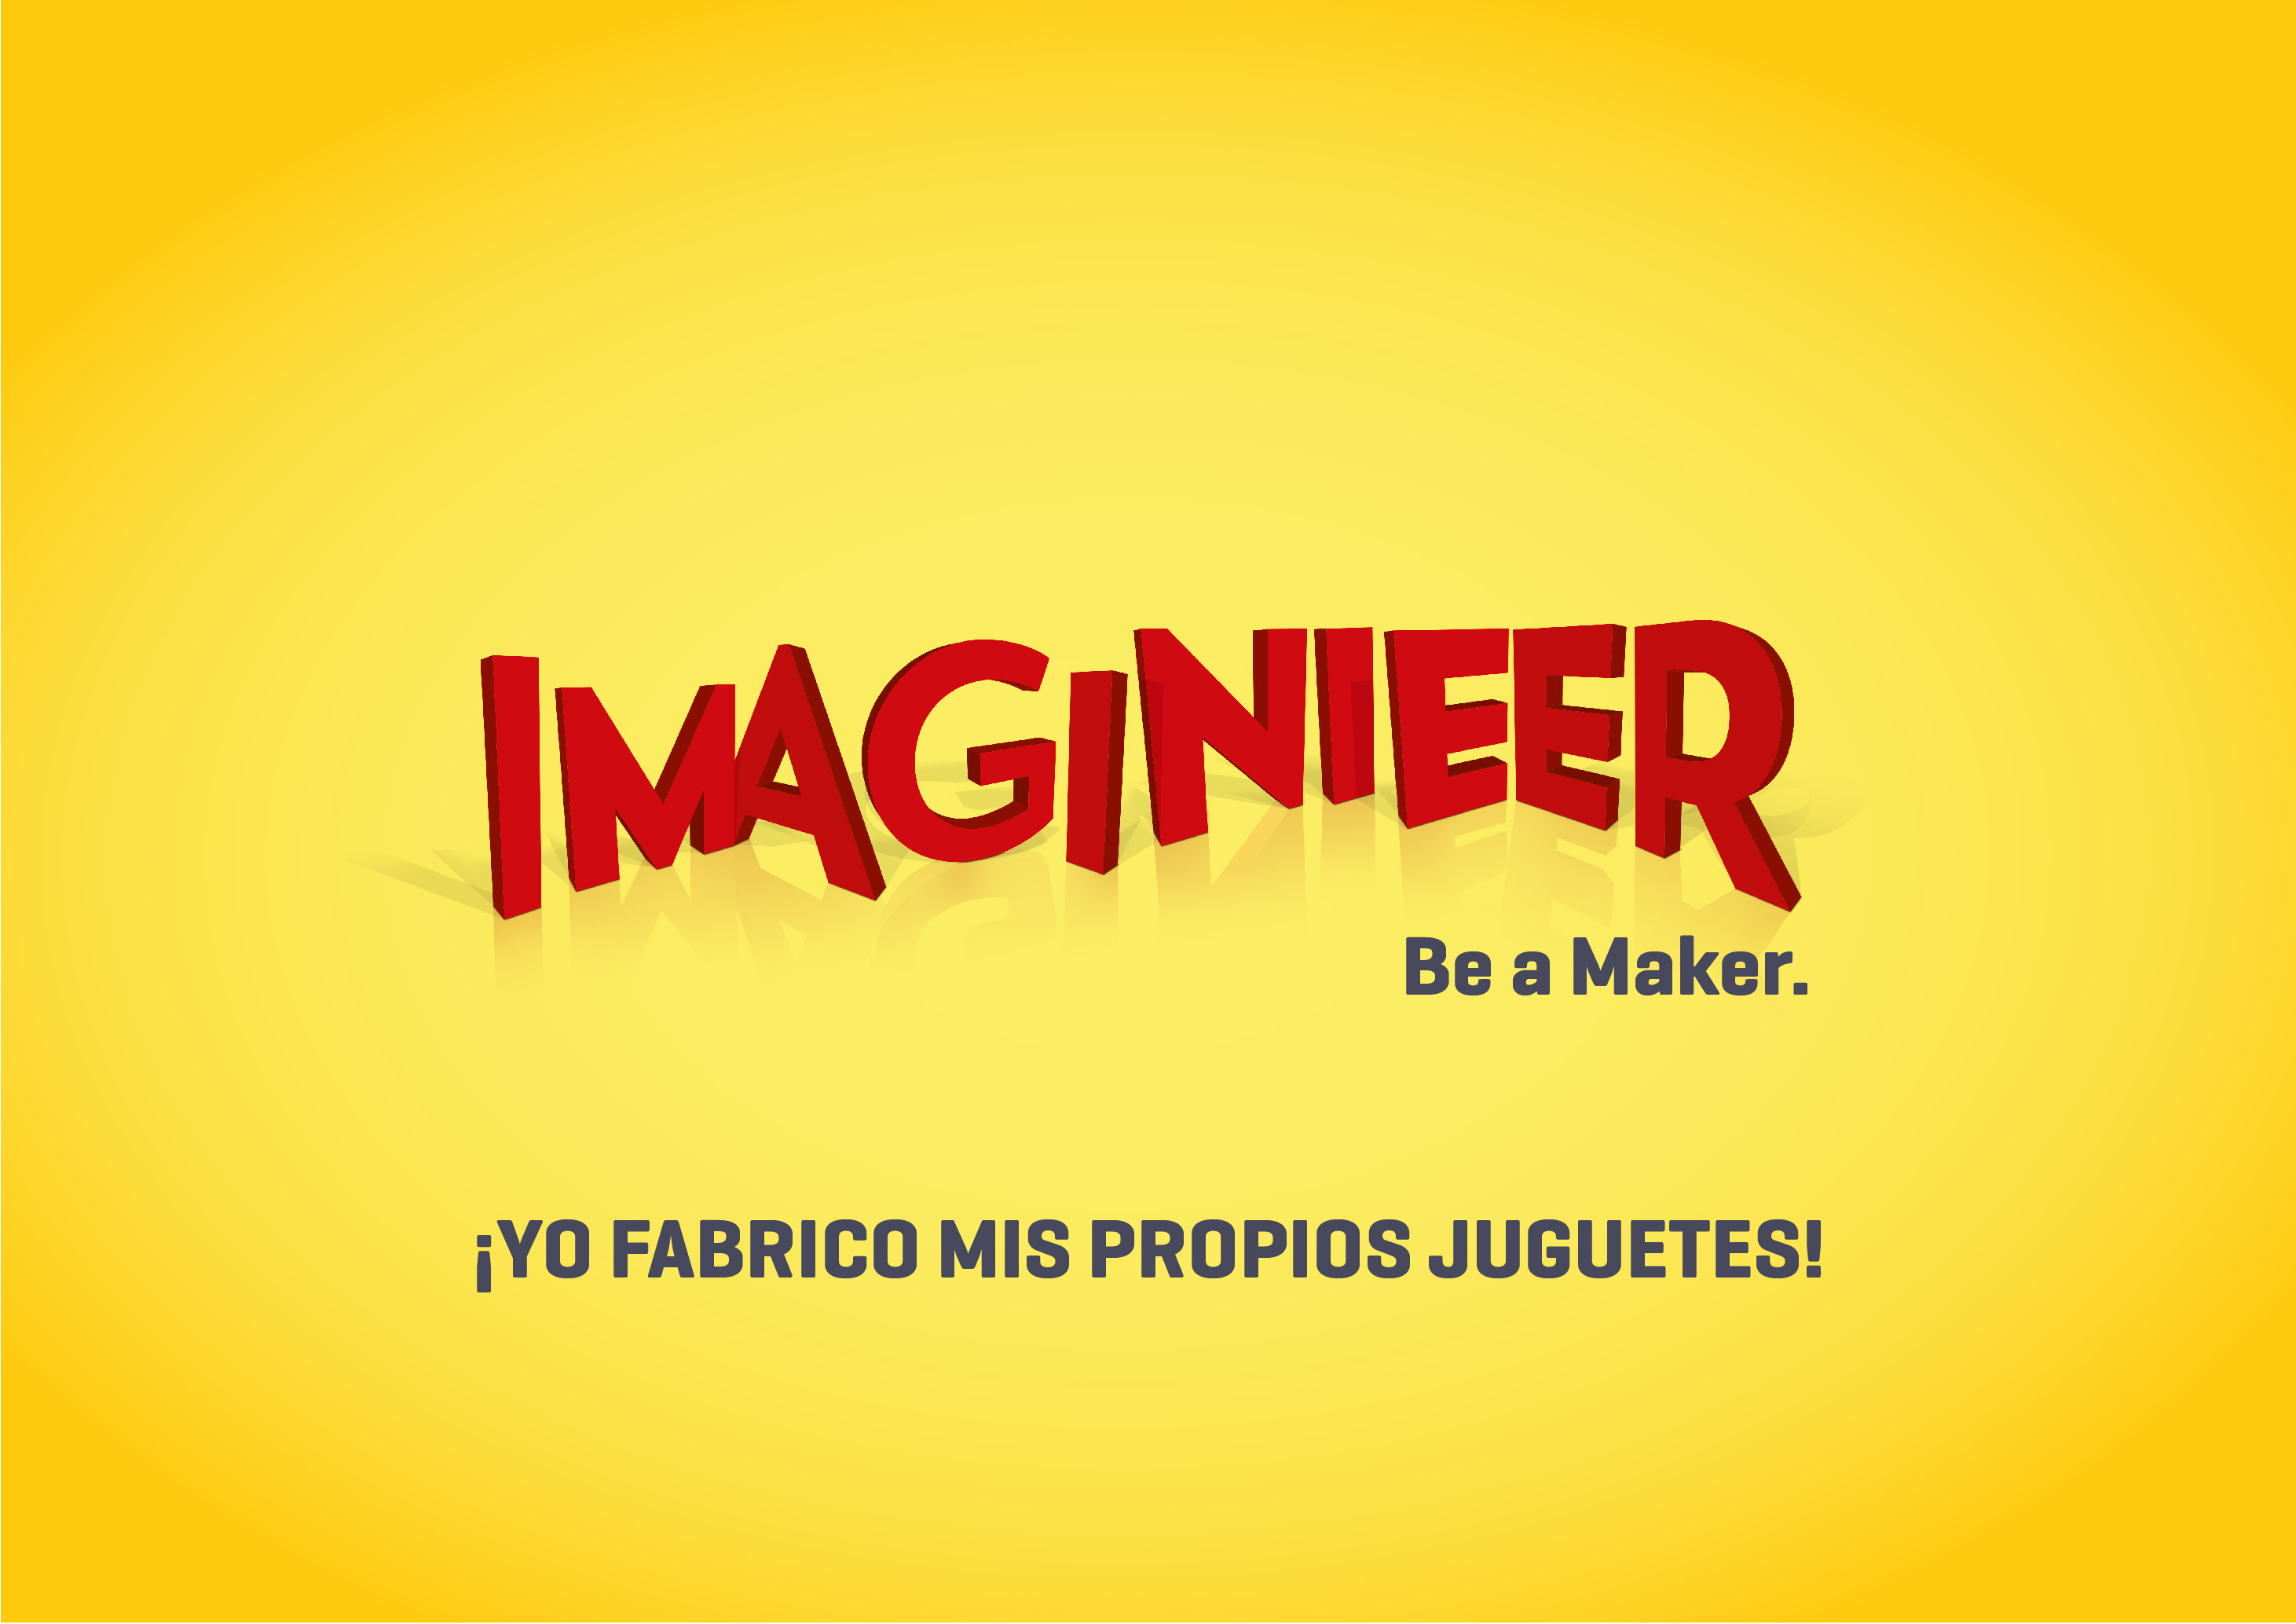 imaginer-1 morillas senorcreativo codigovisual